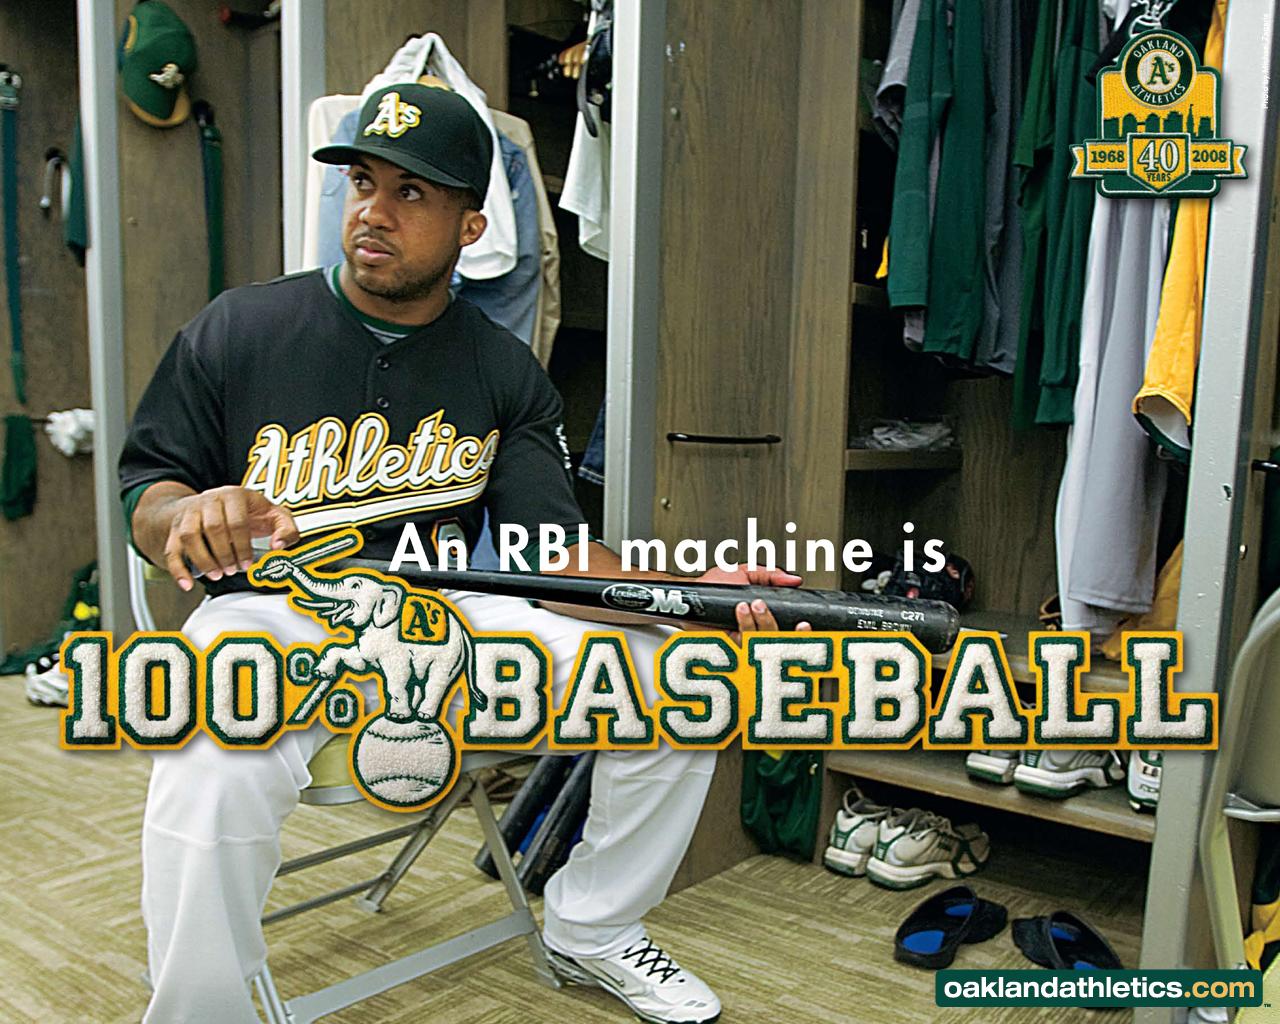 Oakland Athletics Rbis 171548 HD Wallpaper Res 1280x1024 DesktopAS 1280x1024